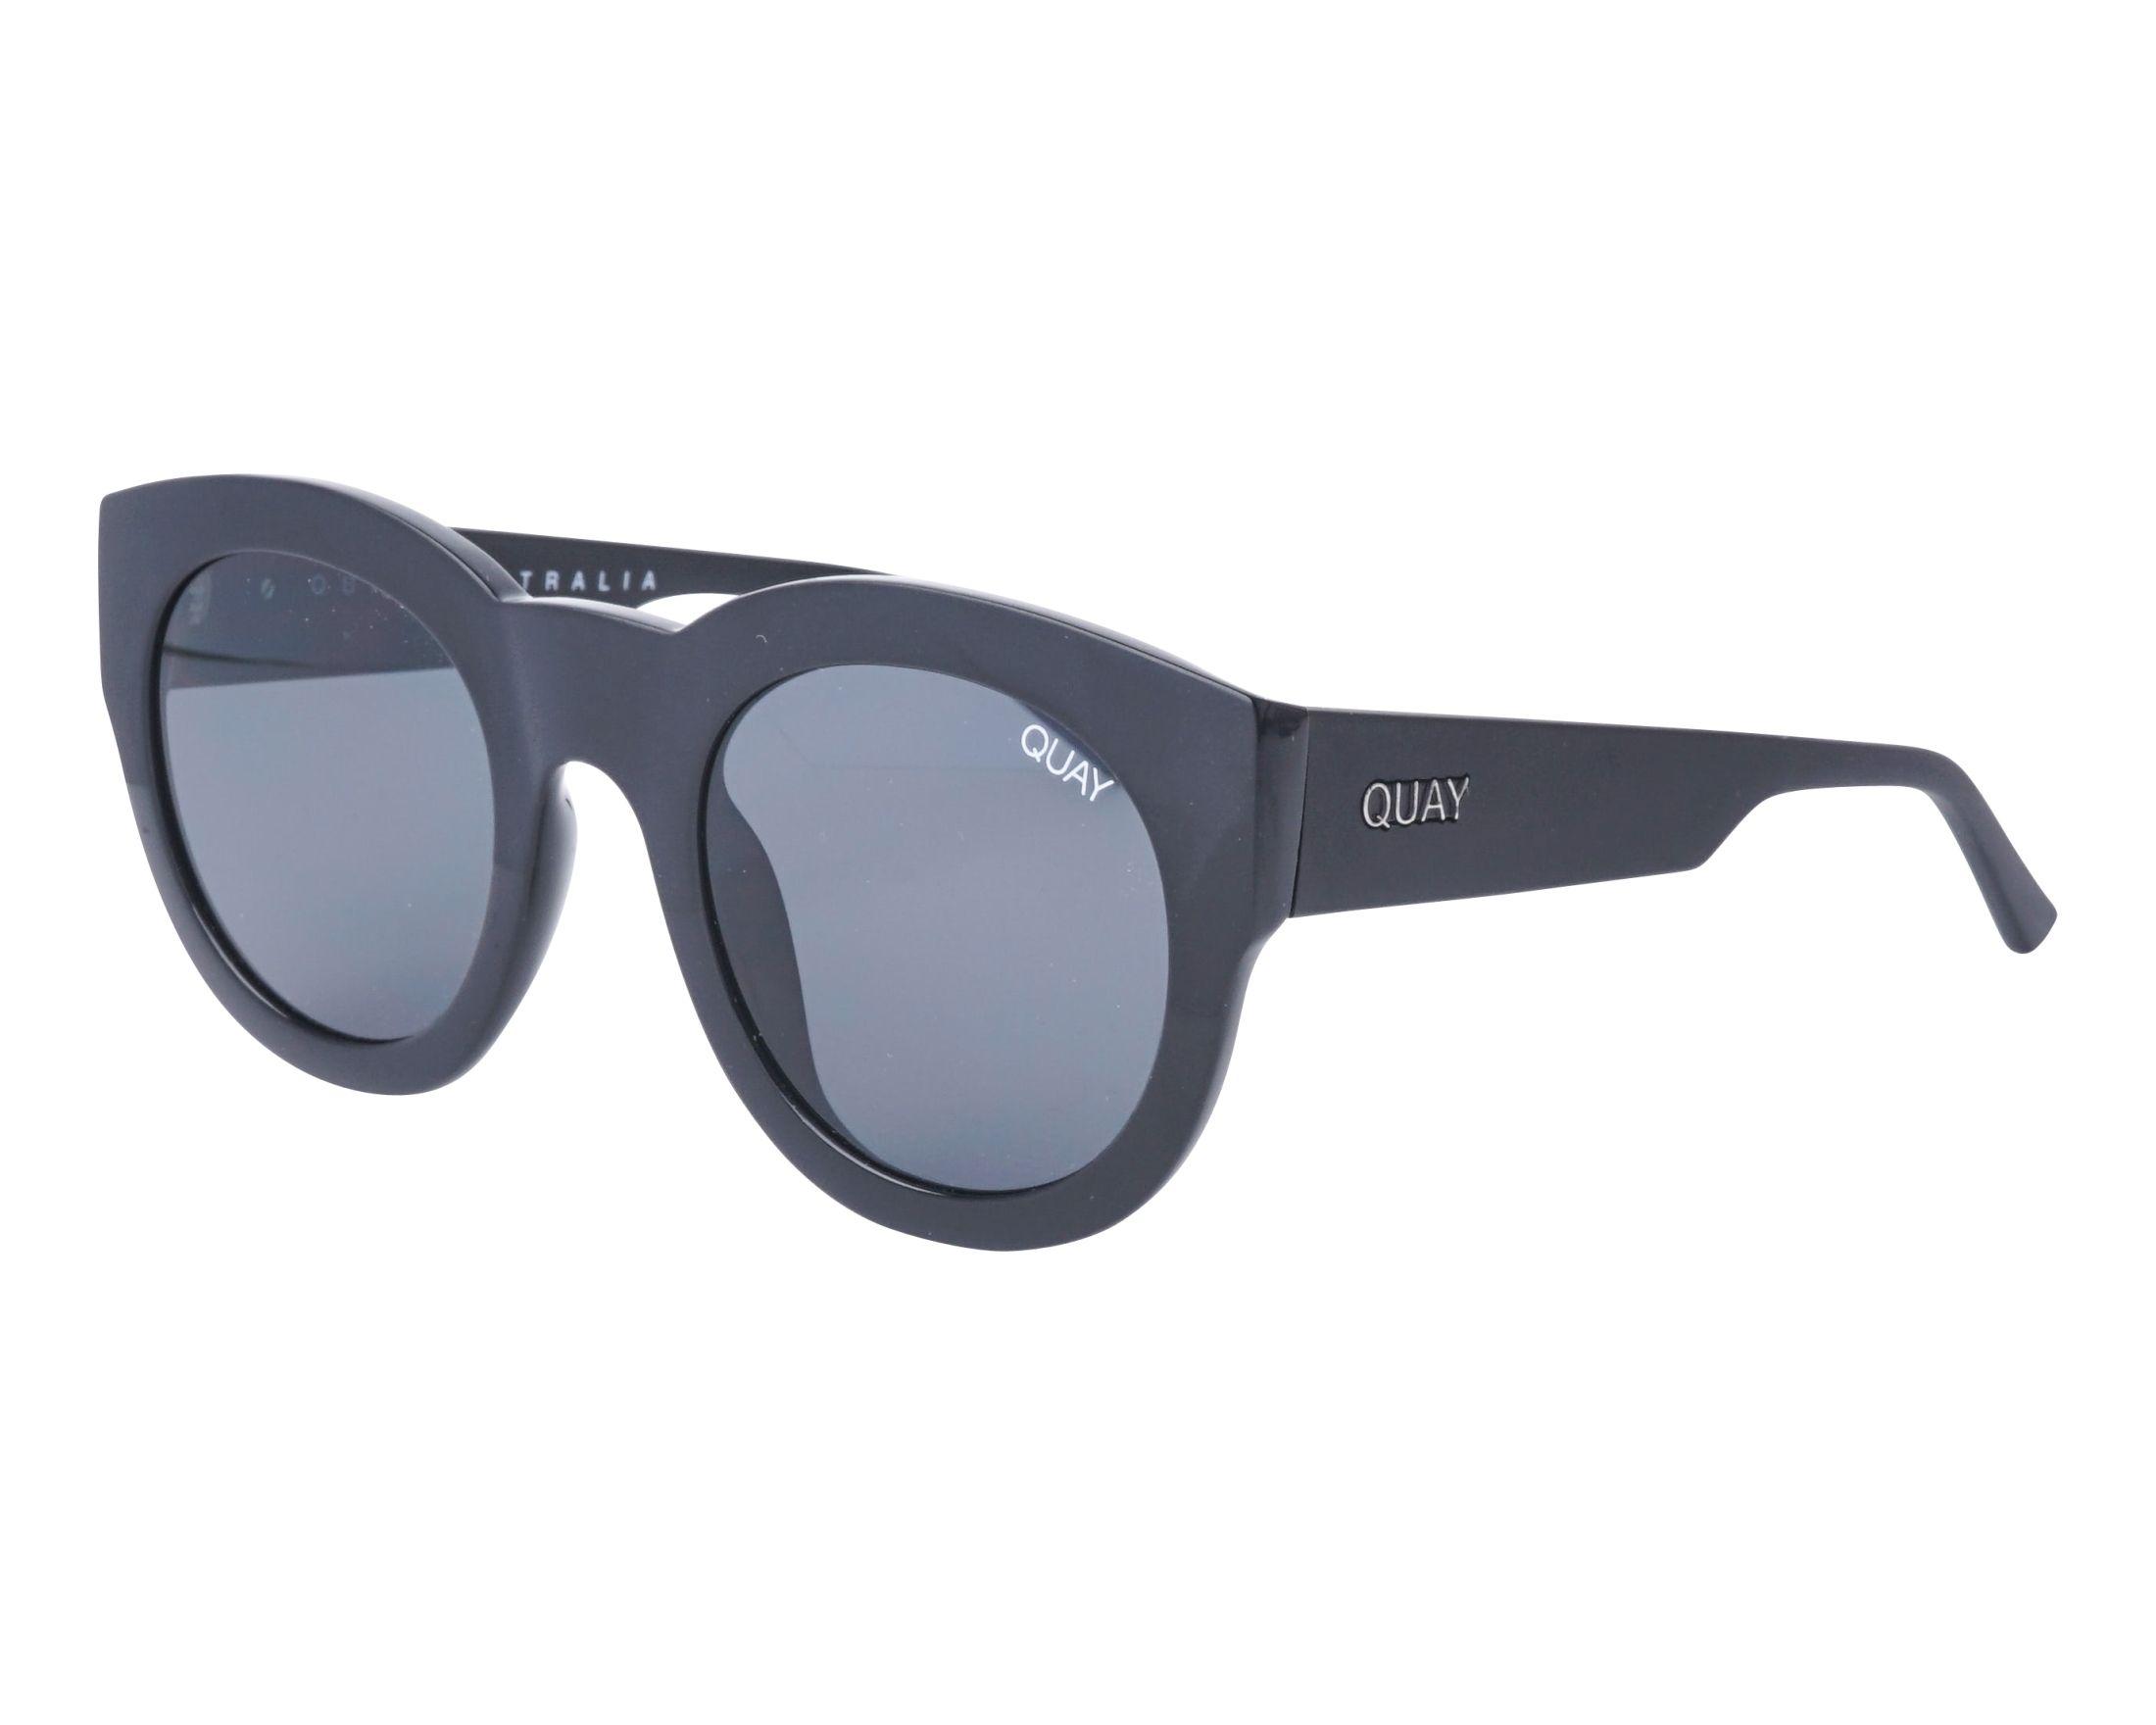 a002fb7df051a Sunglasses Quay Australia QW-000288 BLK-SMK 50-17 Black Black profile view